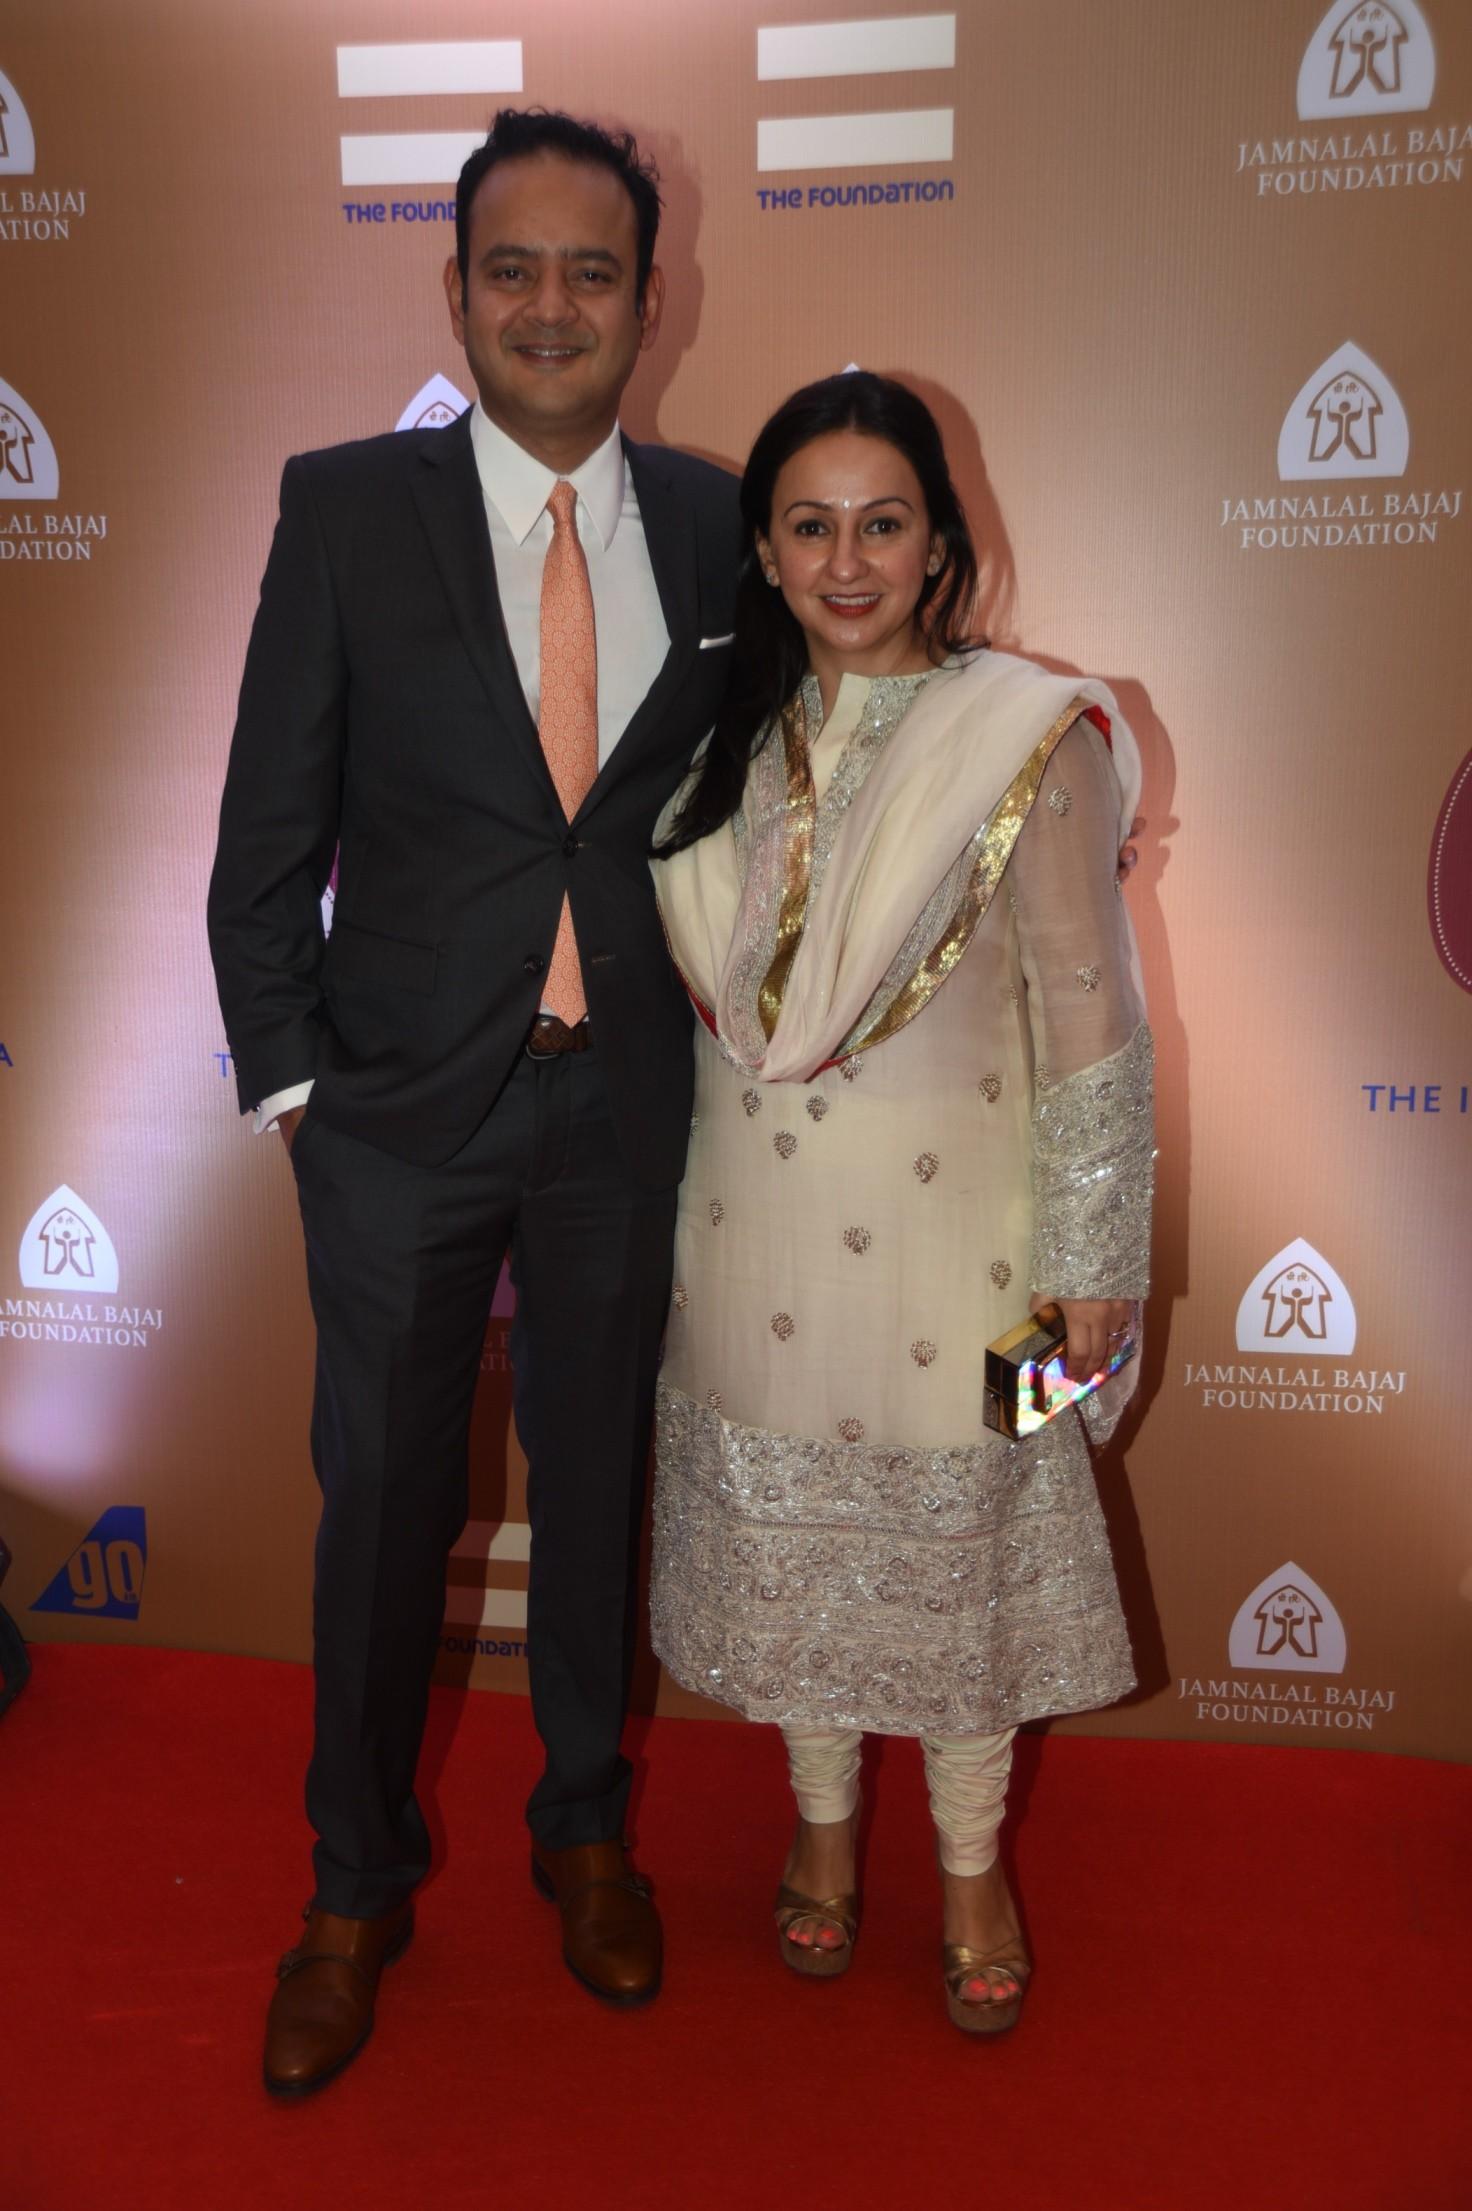 Penny and Sanjeev patel